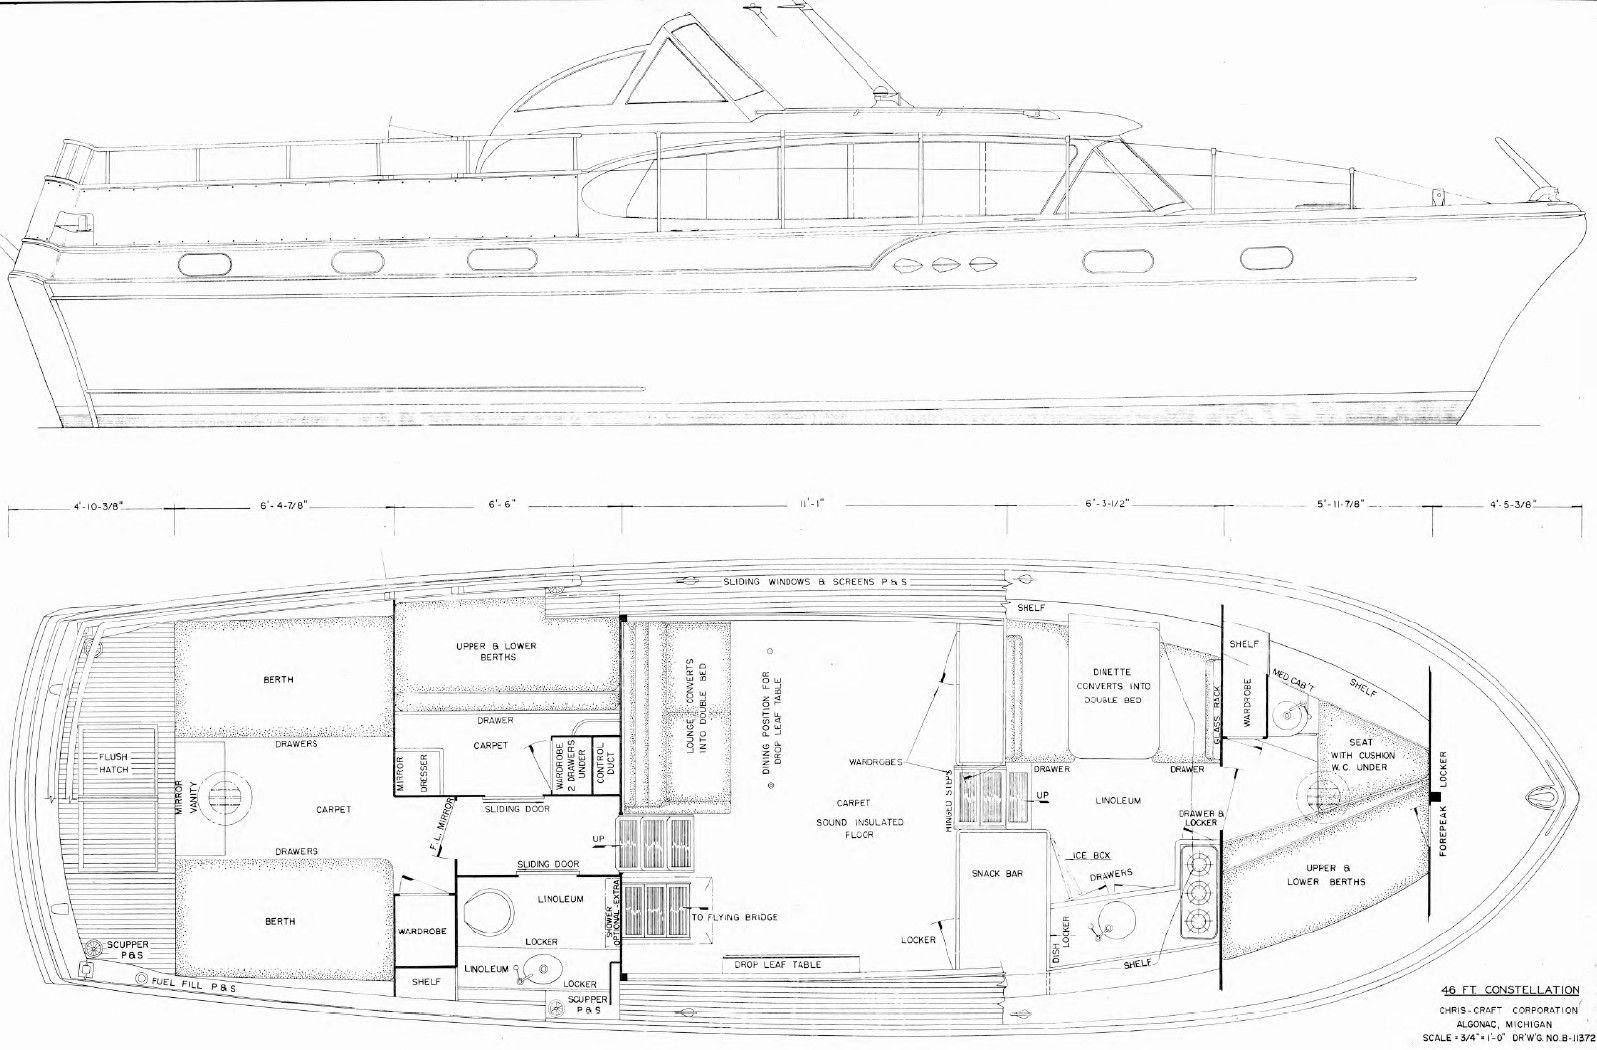 small resolution of 1957 46 chris craft constellation plan drawing